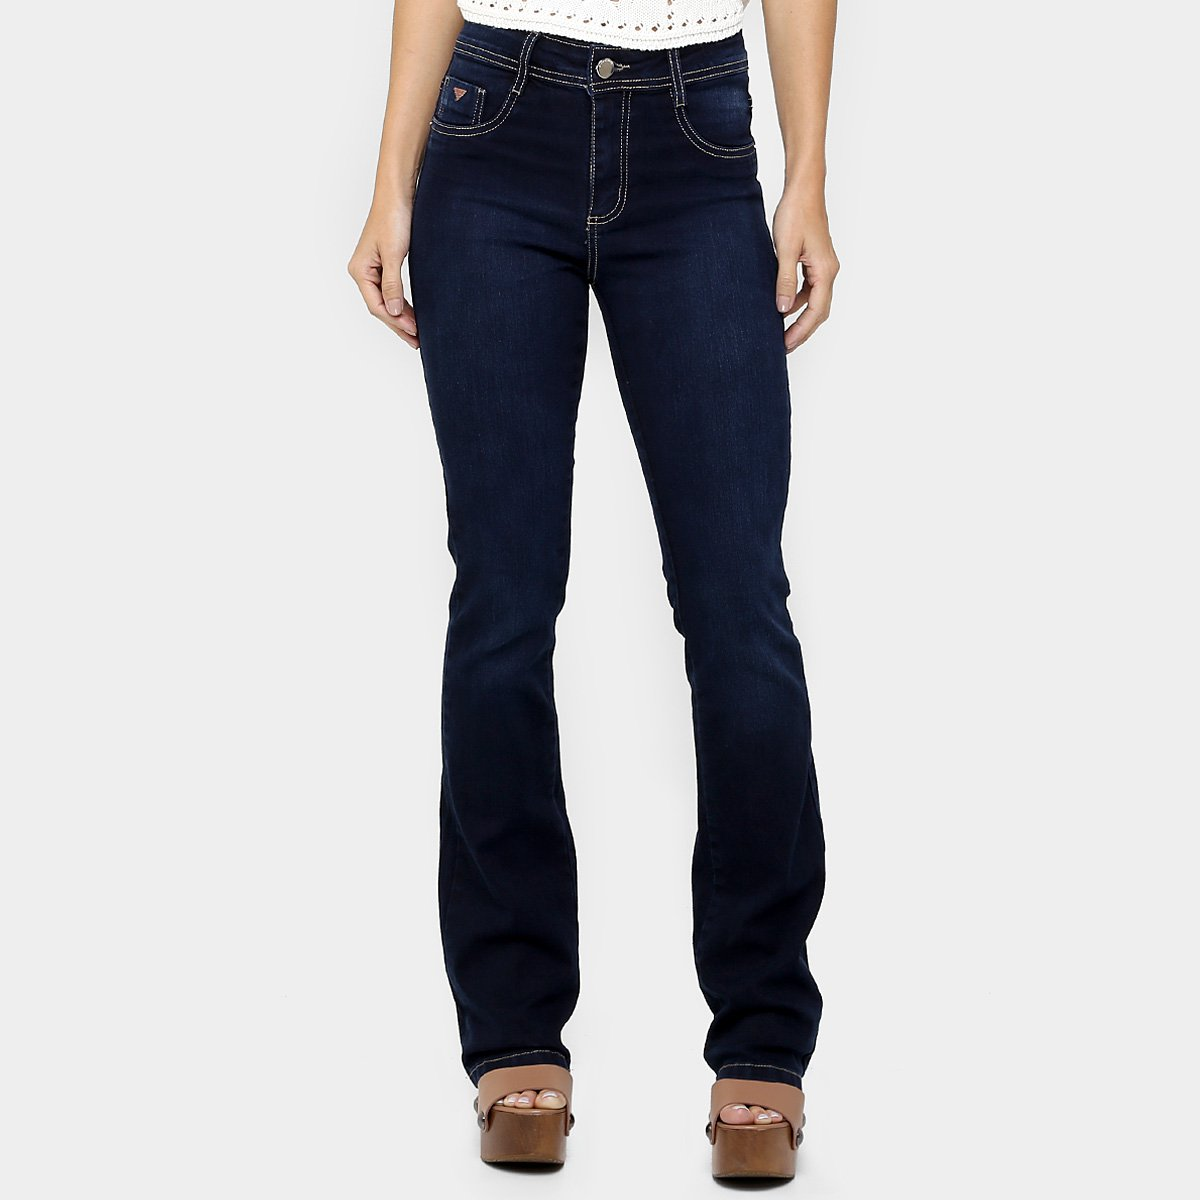 8cee104f9d Calça Jeans Sawary Bootcut Cintura Alta - Compre Agora